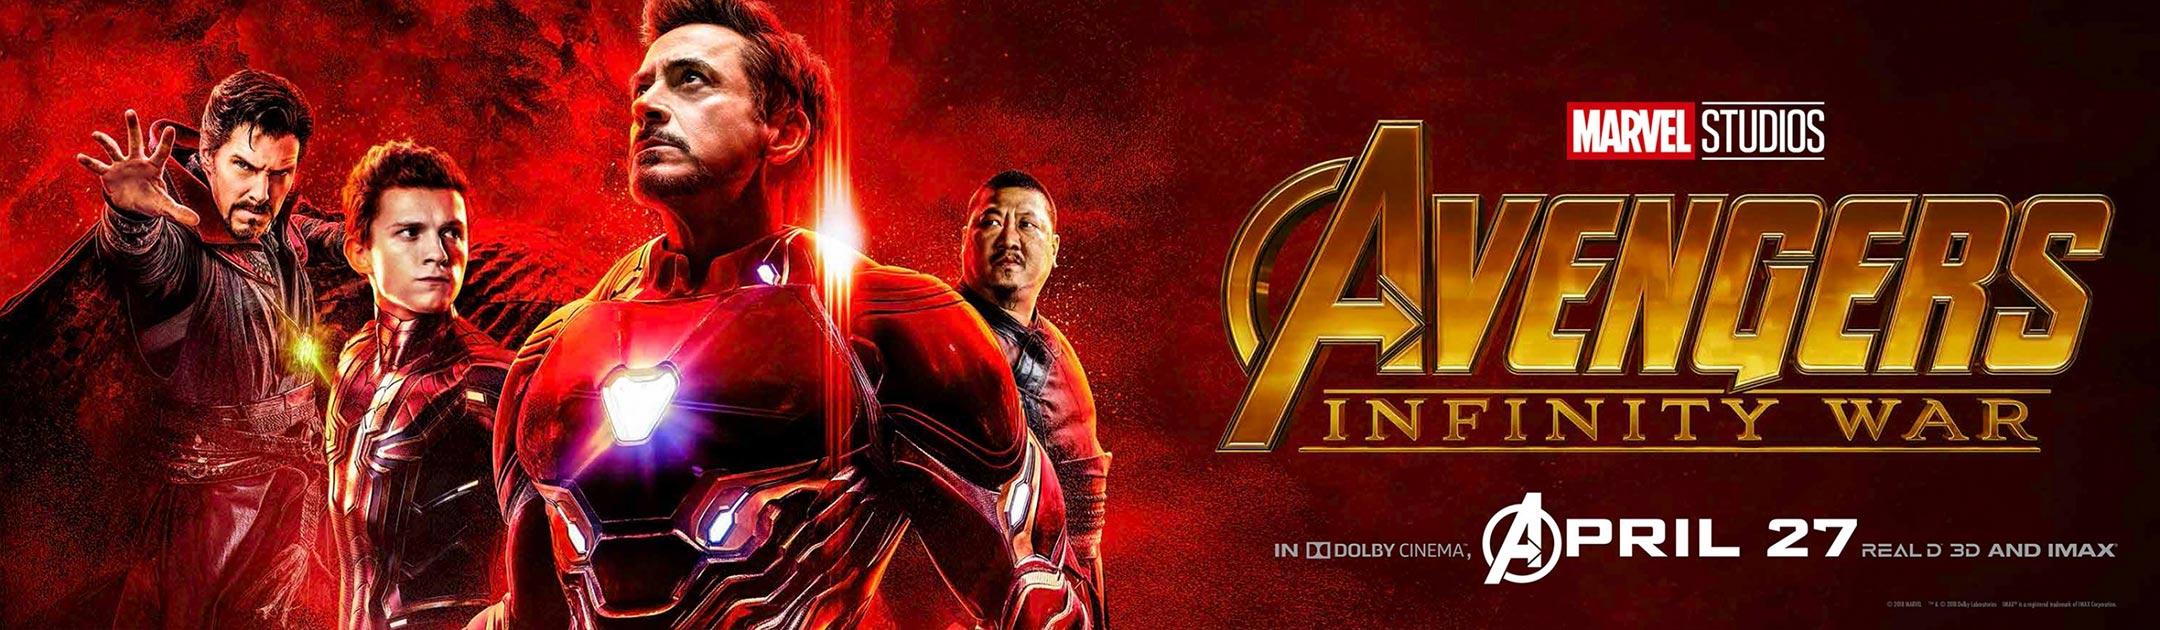 Avengers Infinity War 2018 Poster 39 Trailer Addict